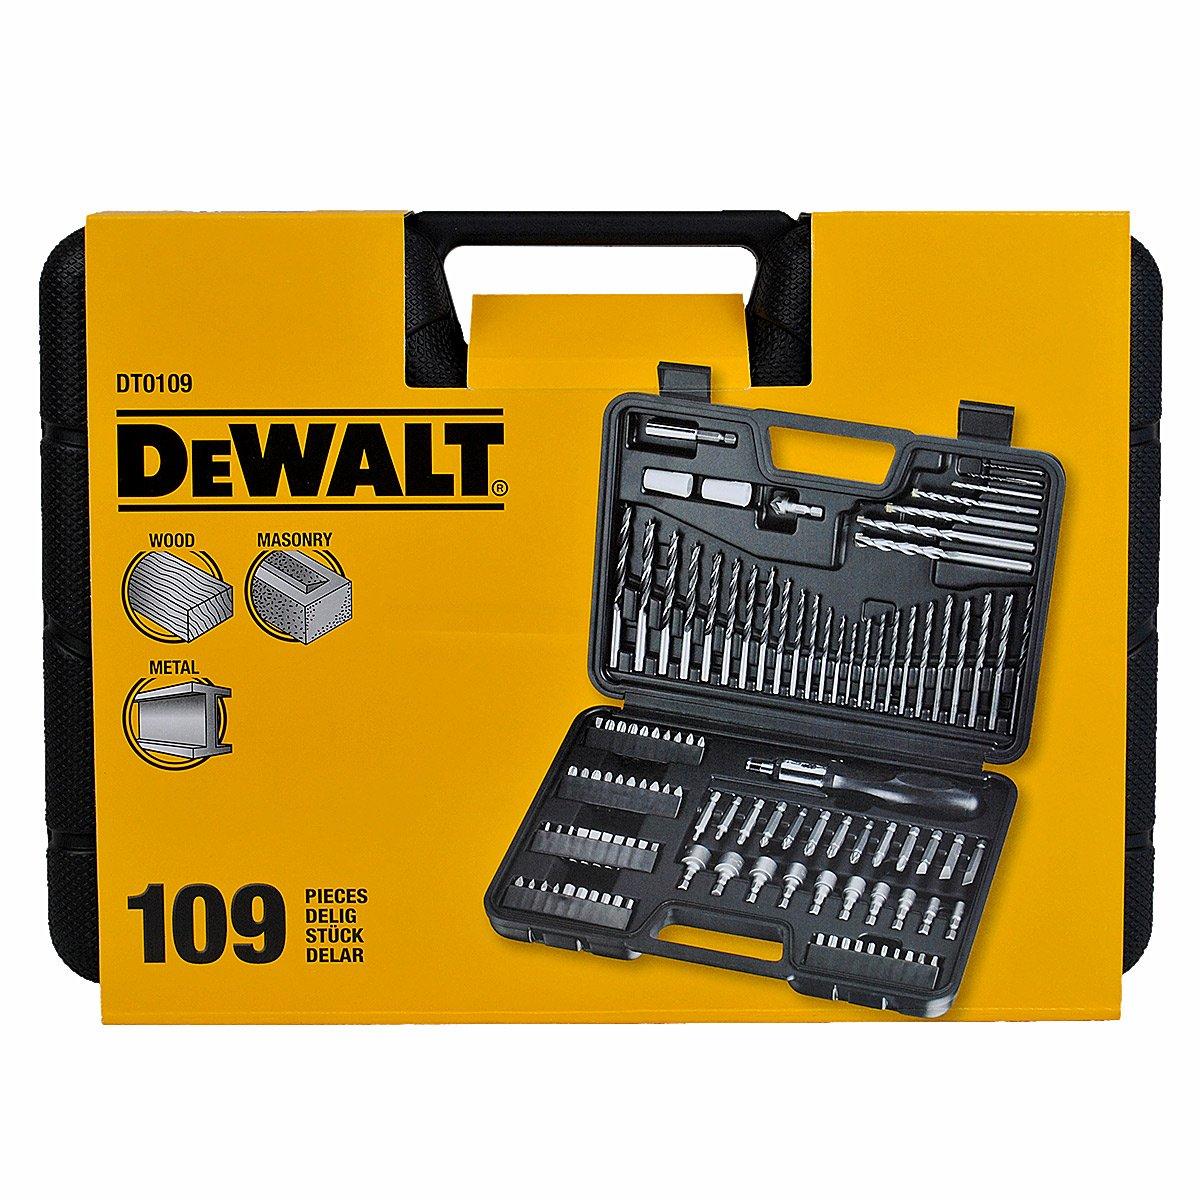 DeWalt DT0109 Screwdriver and Drillbit Set (109 Pieces)